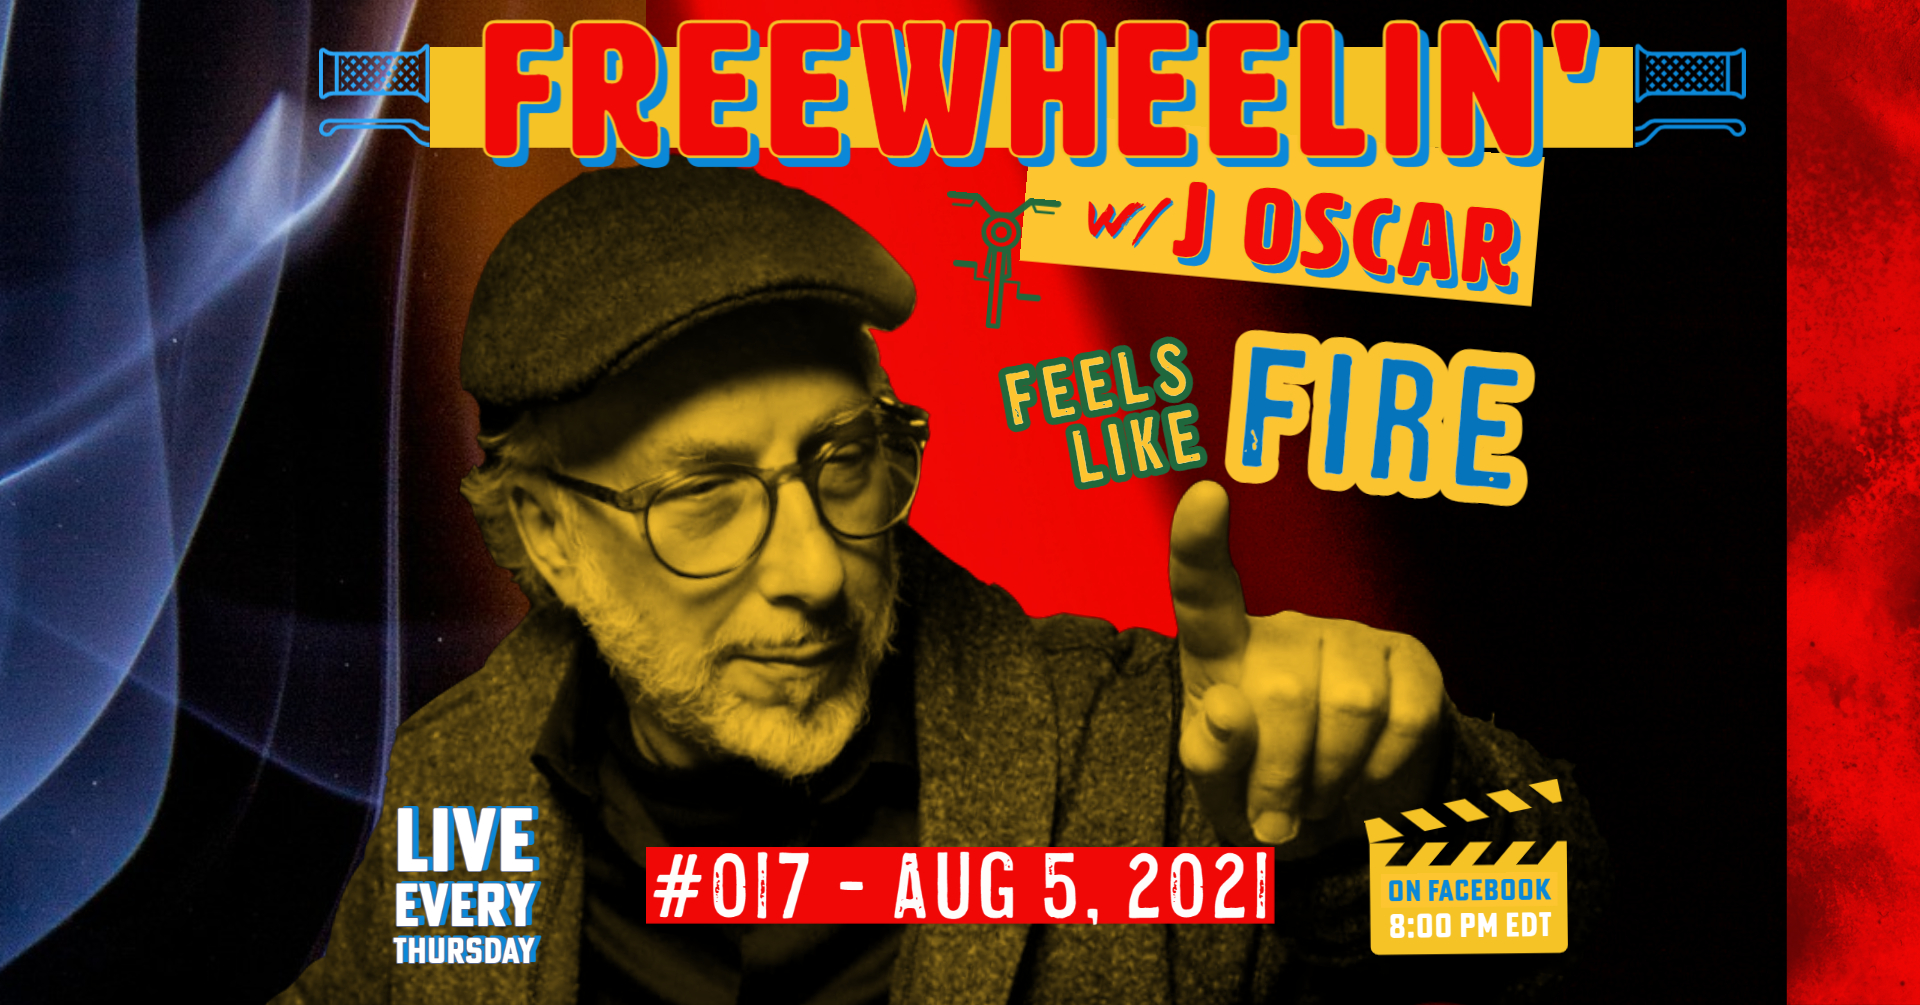 Freewheelin 017 Feels Like Fire - Aug 5, 2021